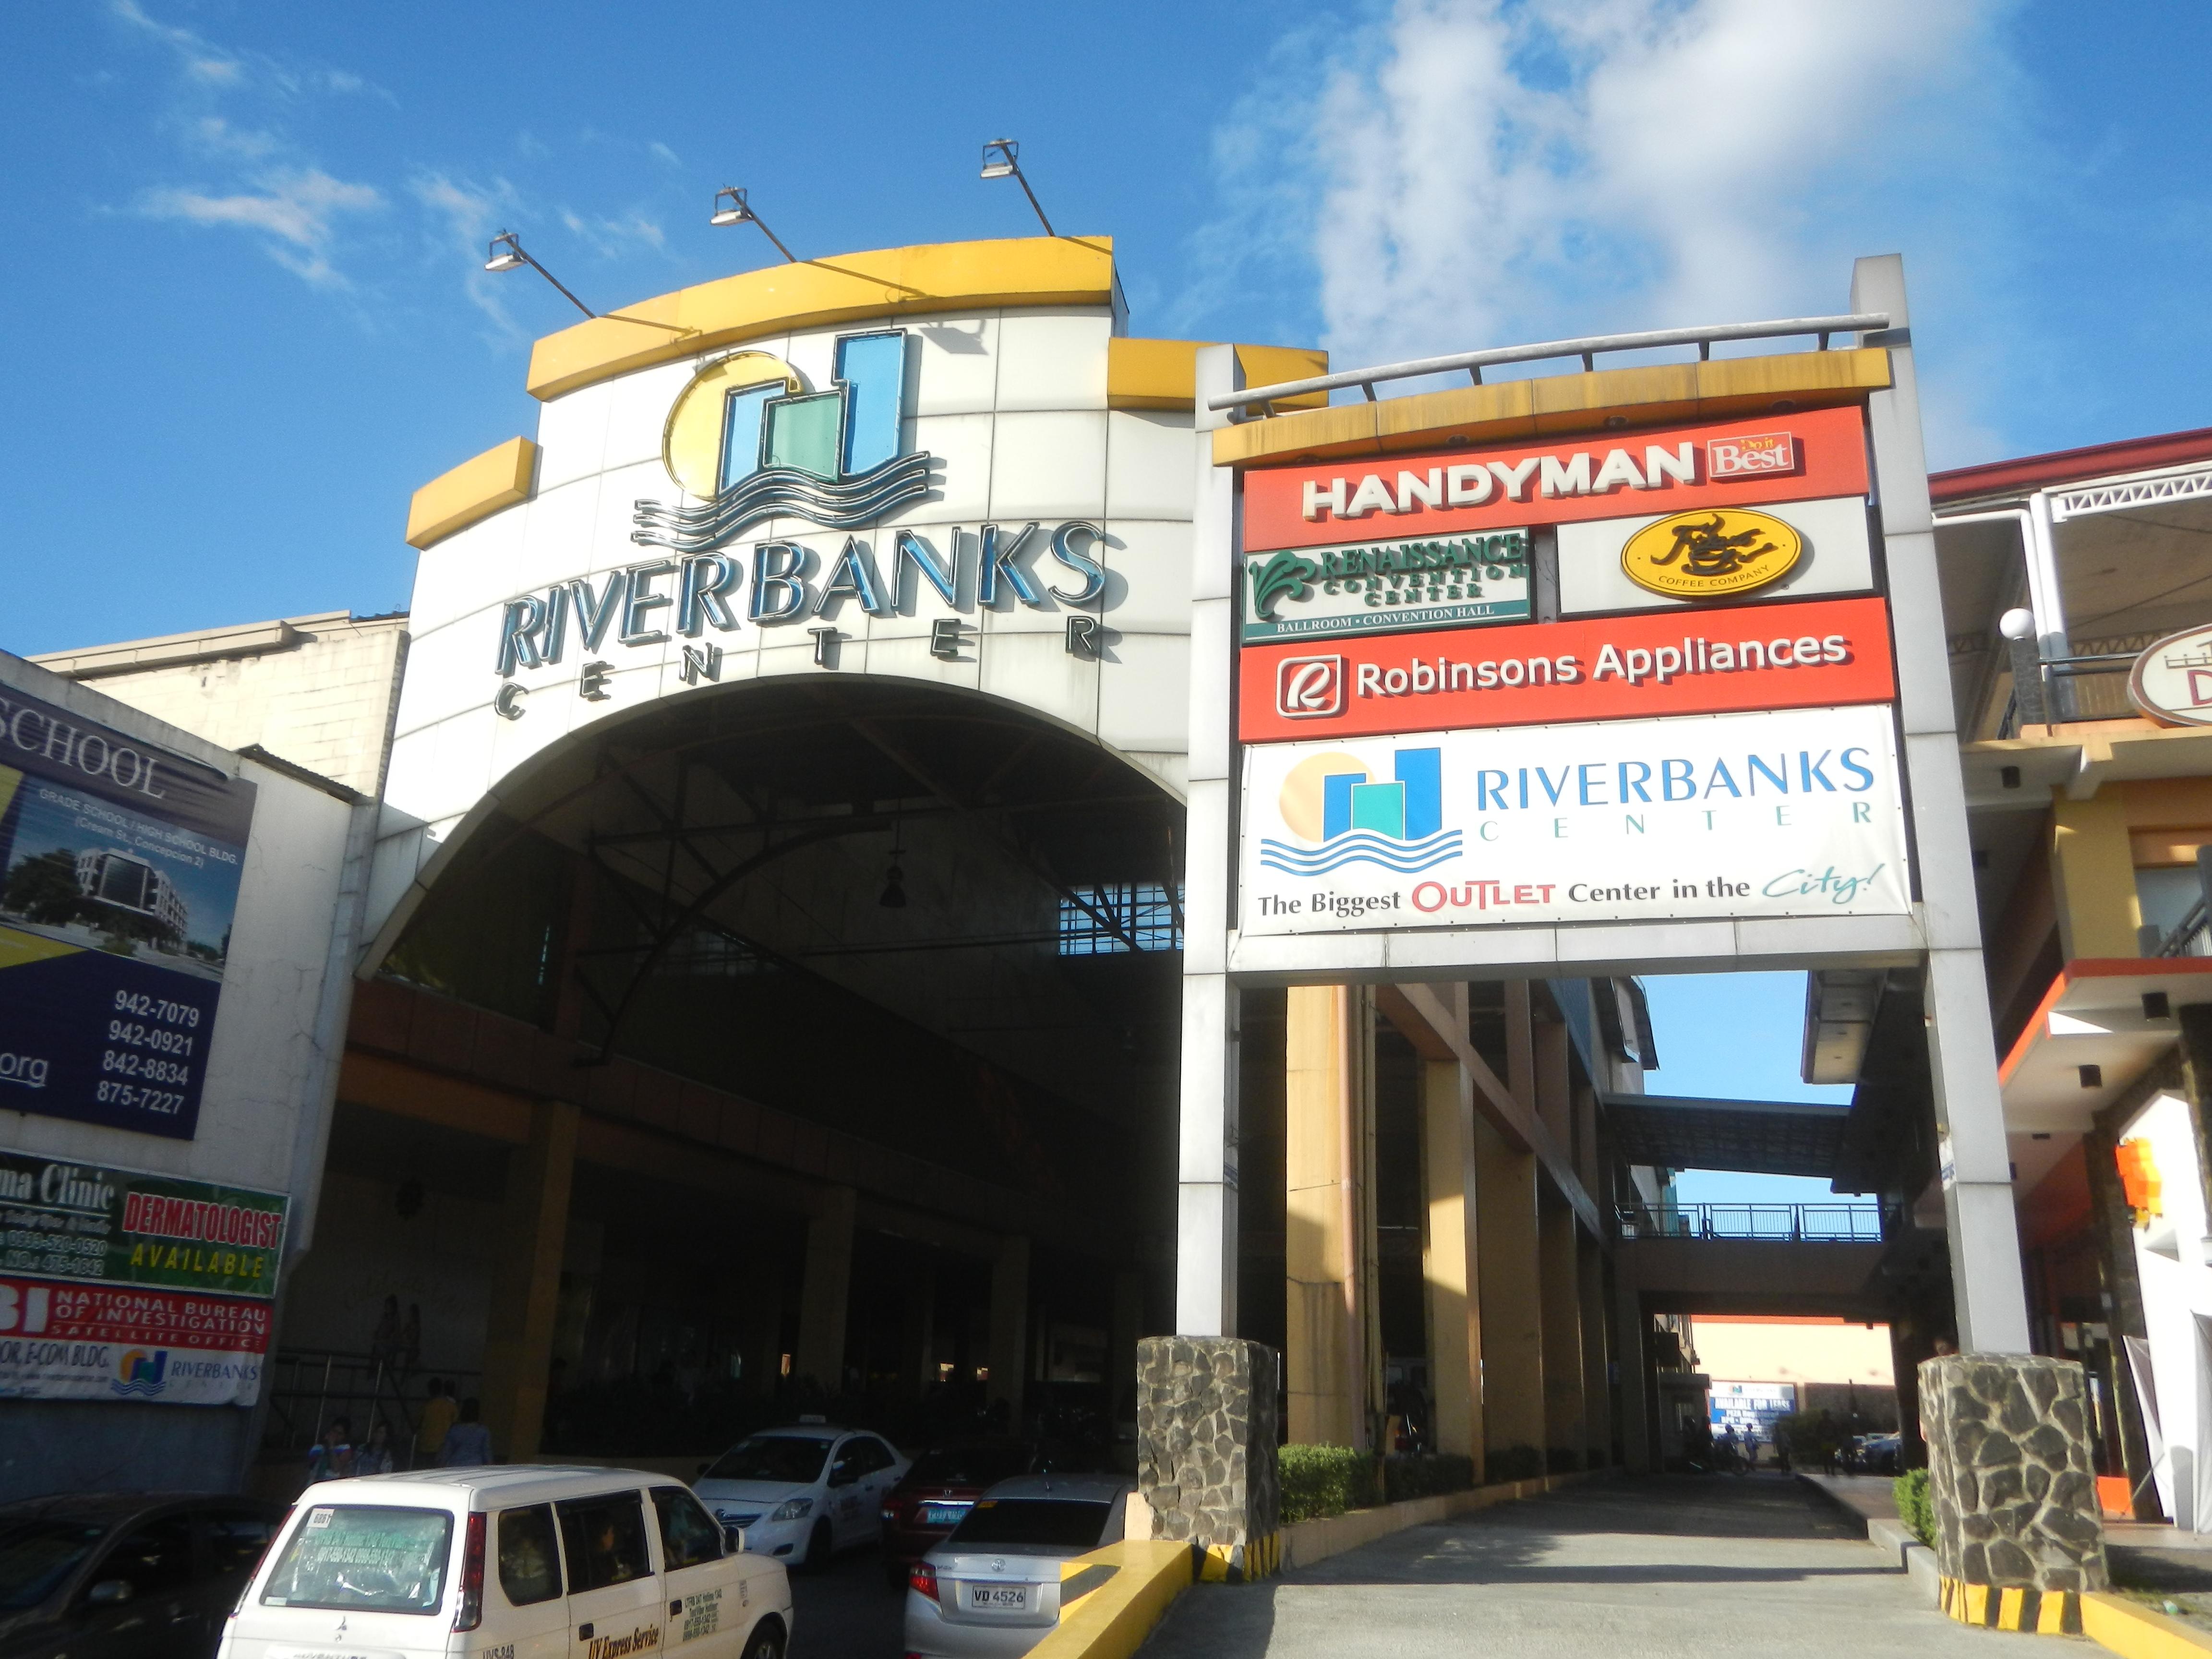 Riverbanks Center - Wikipedia